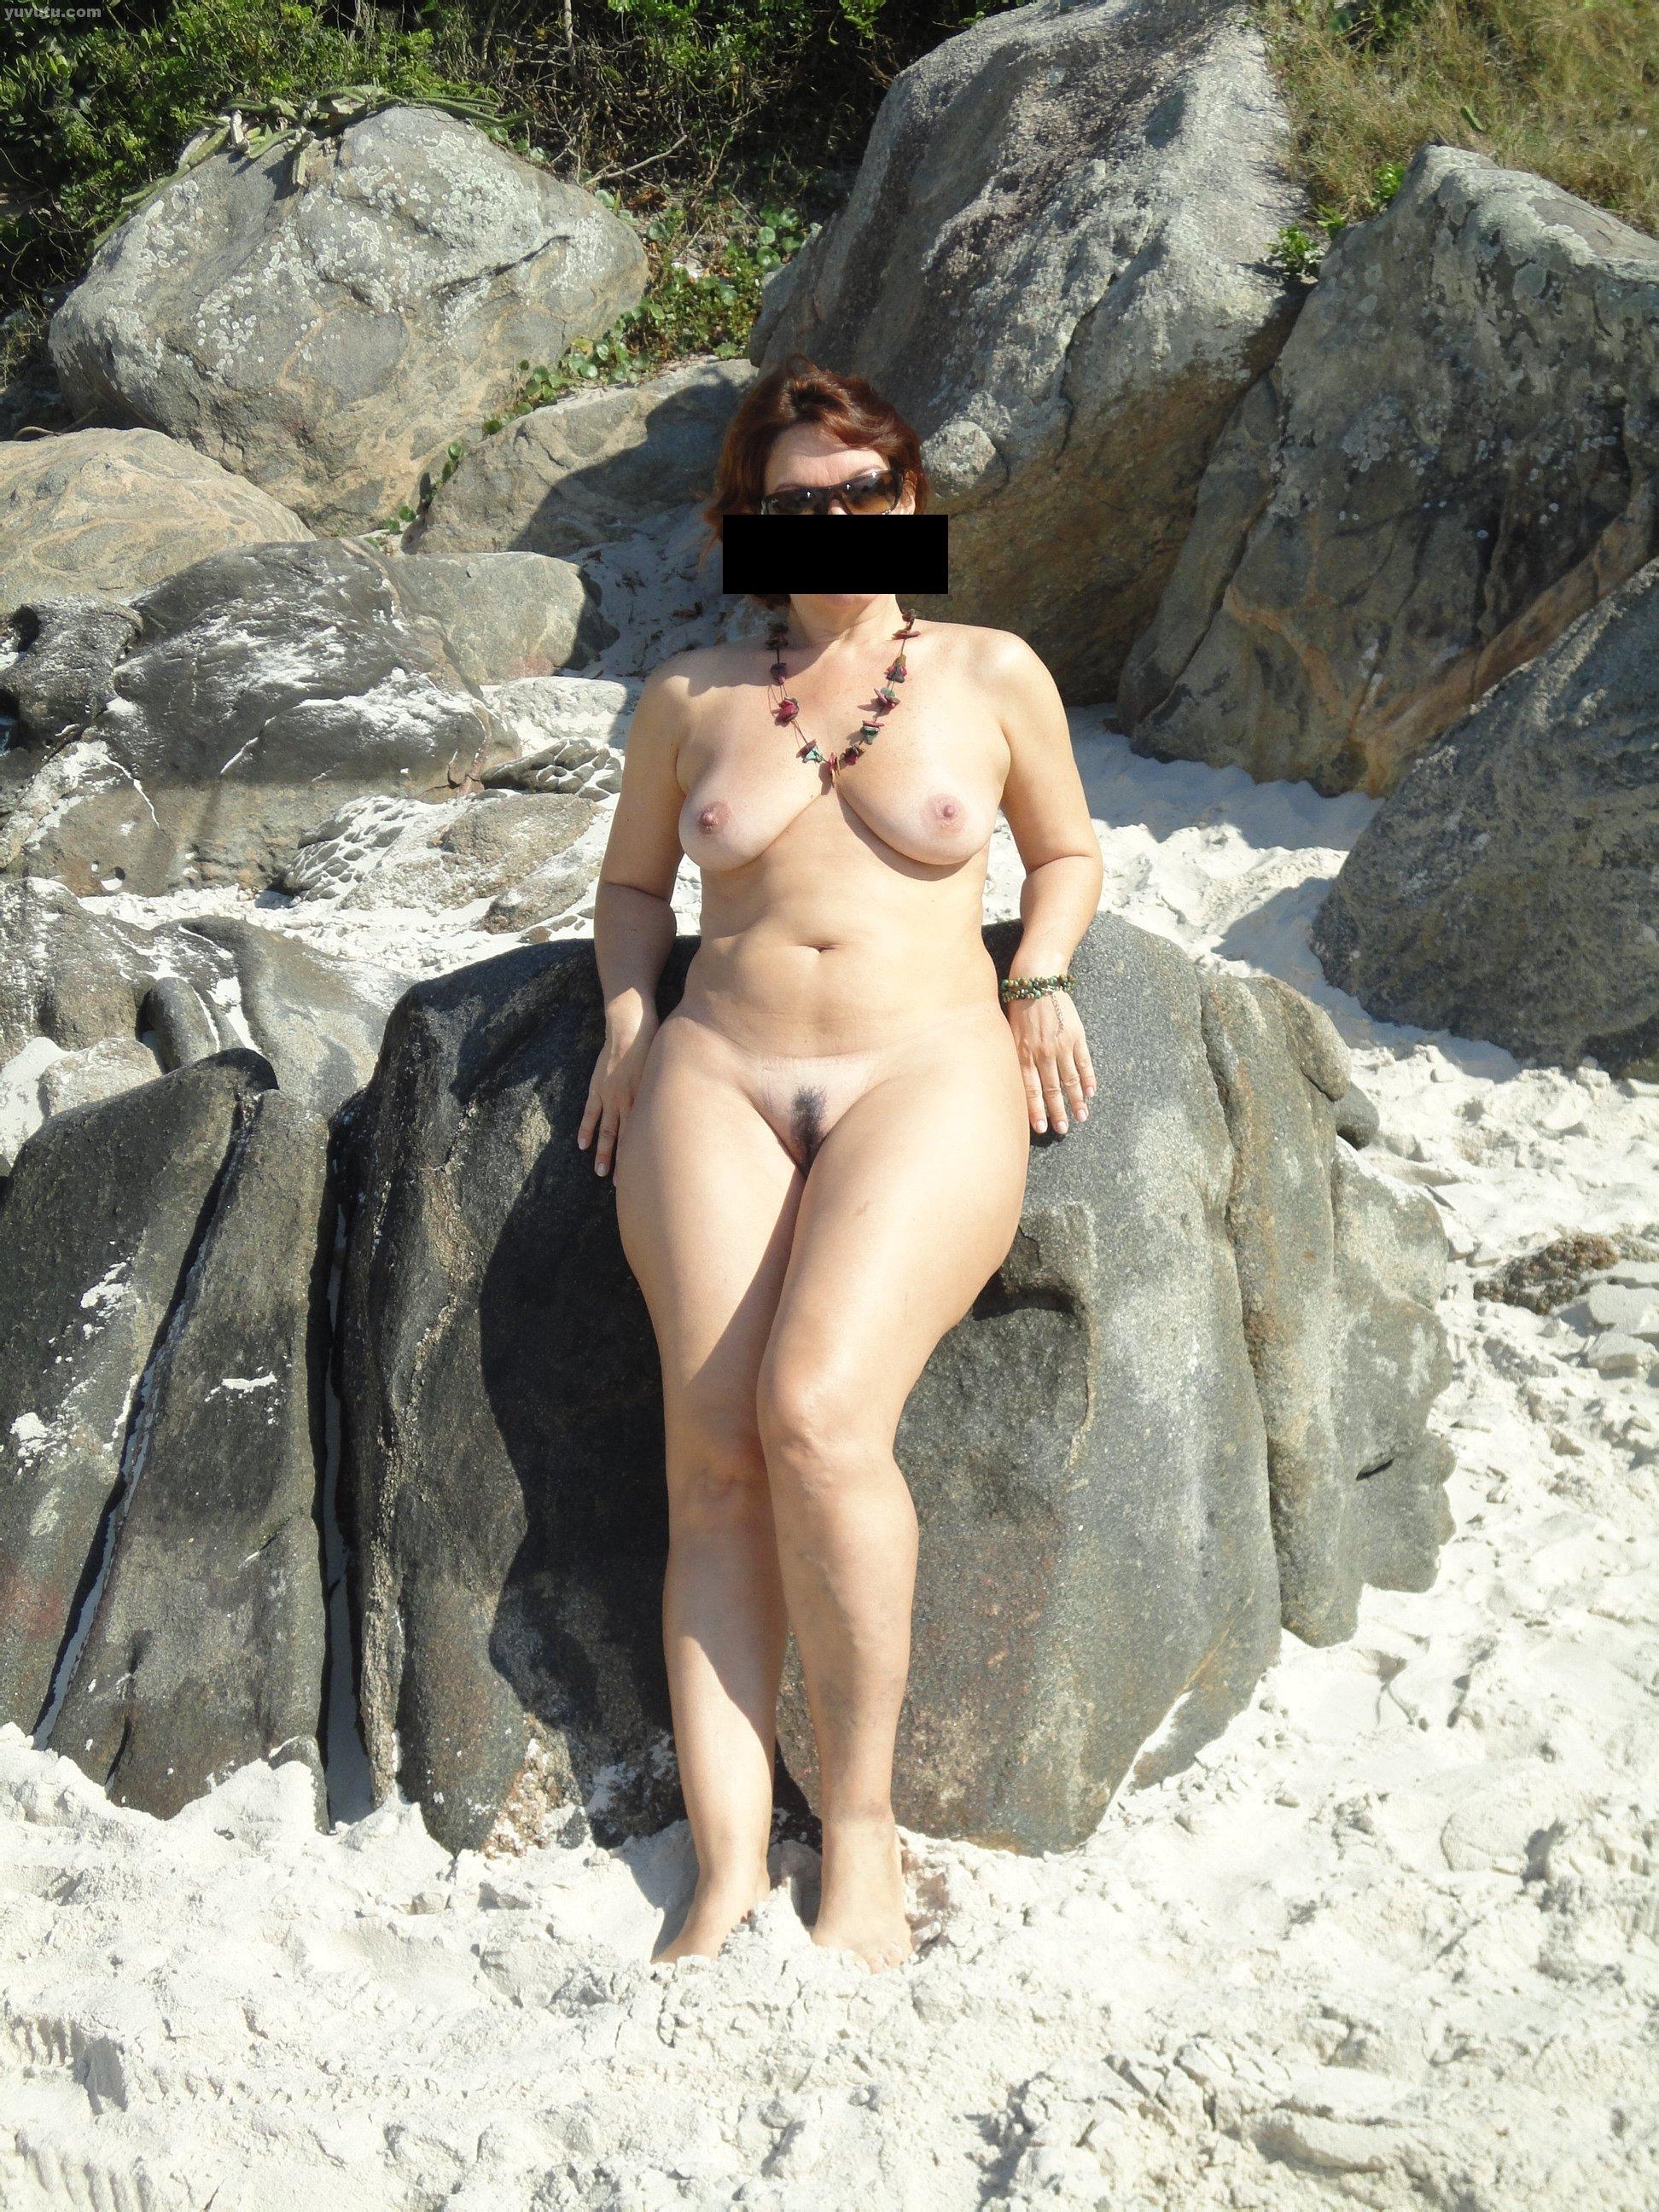 Beach slideshow on yuvutu homemade amateur porn movies and xxx